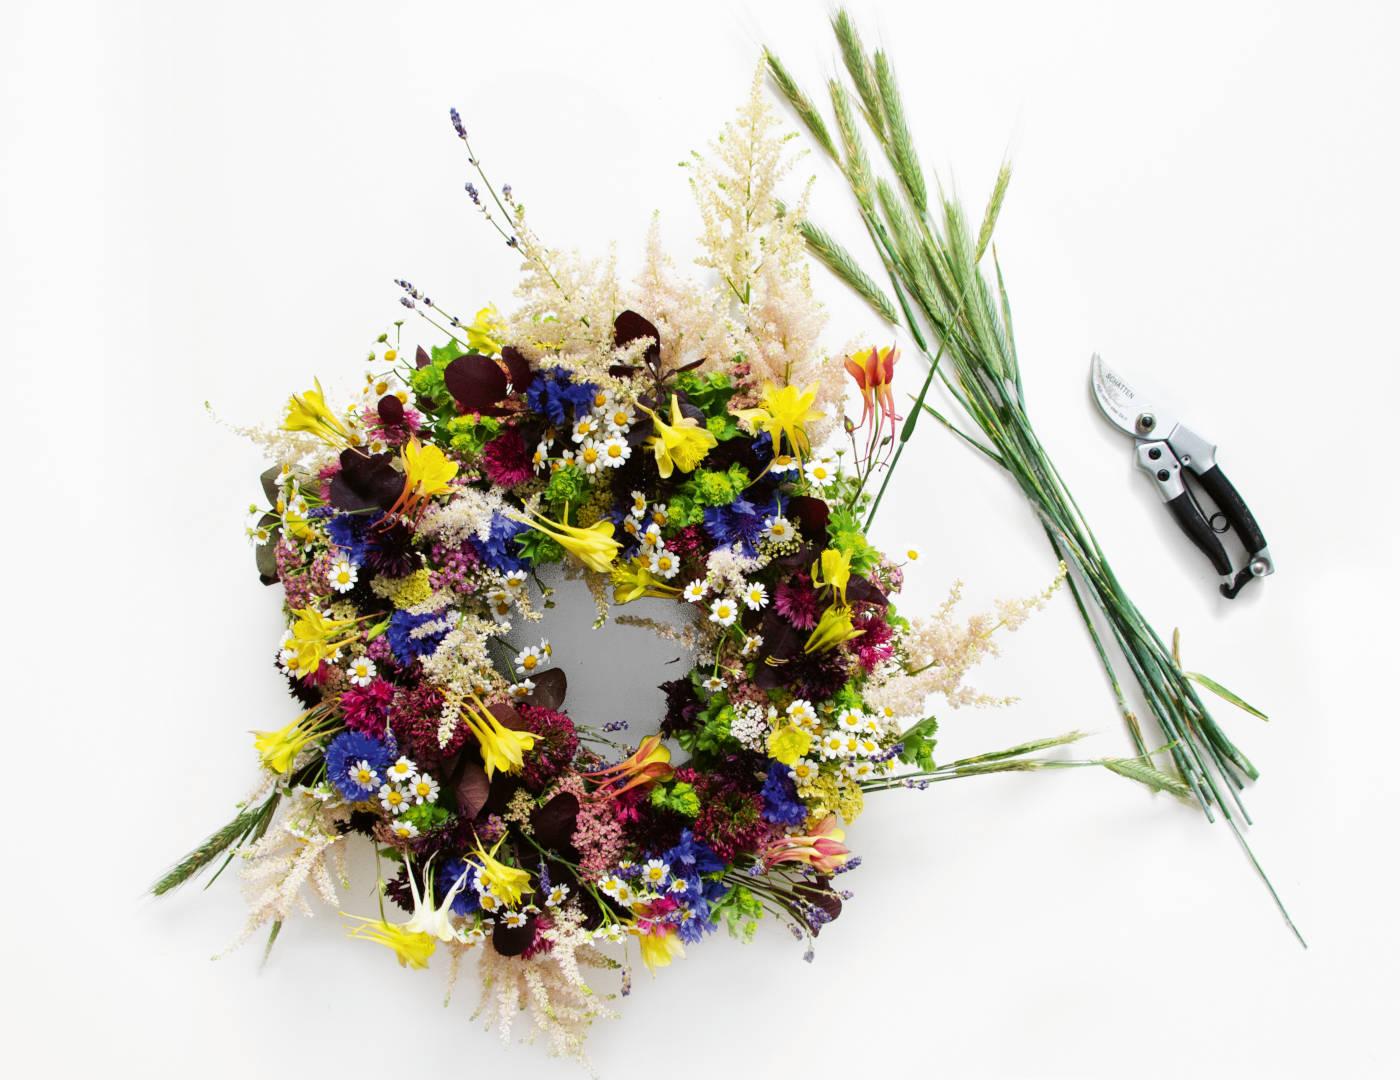 DIY-Wiesenblumen-Kranz // HIMBEER